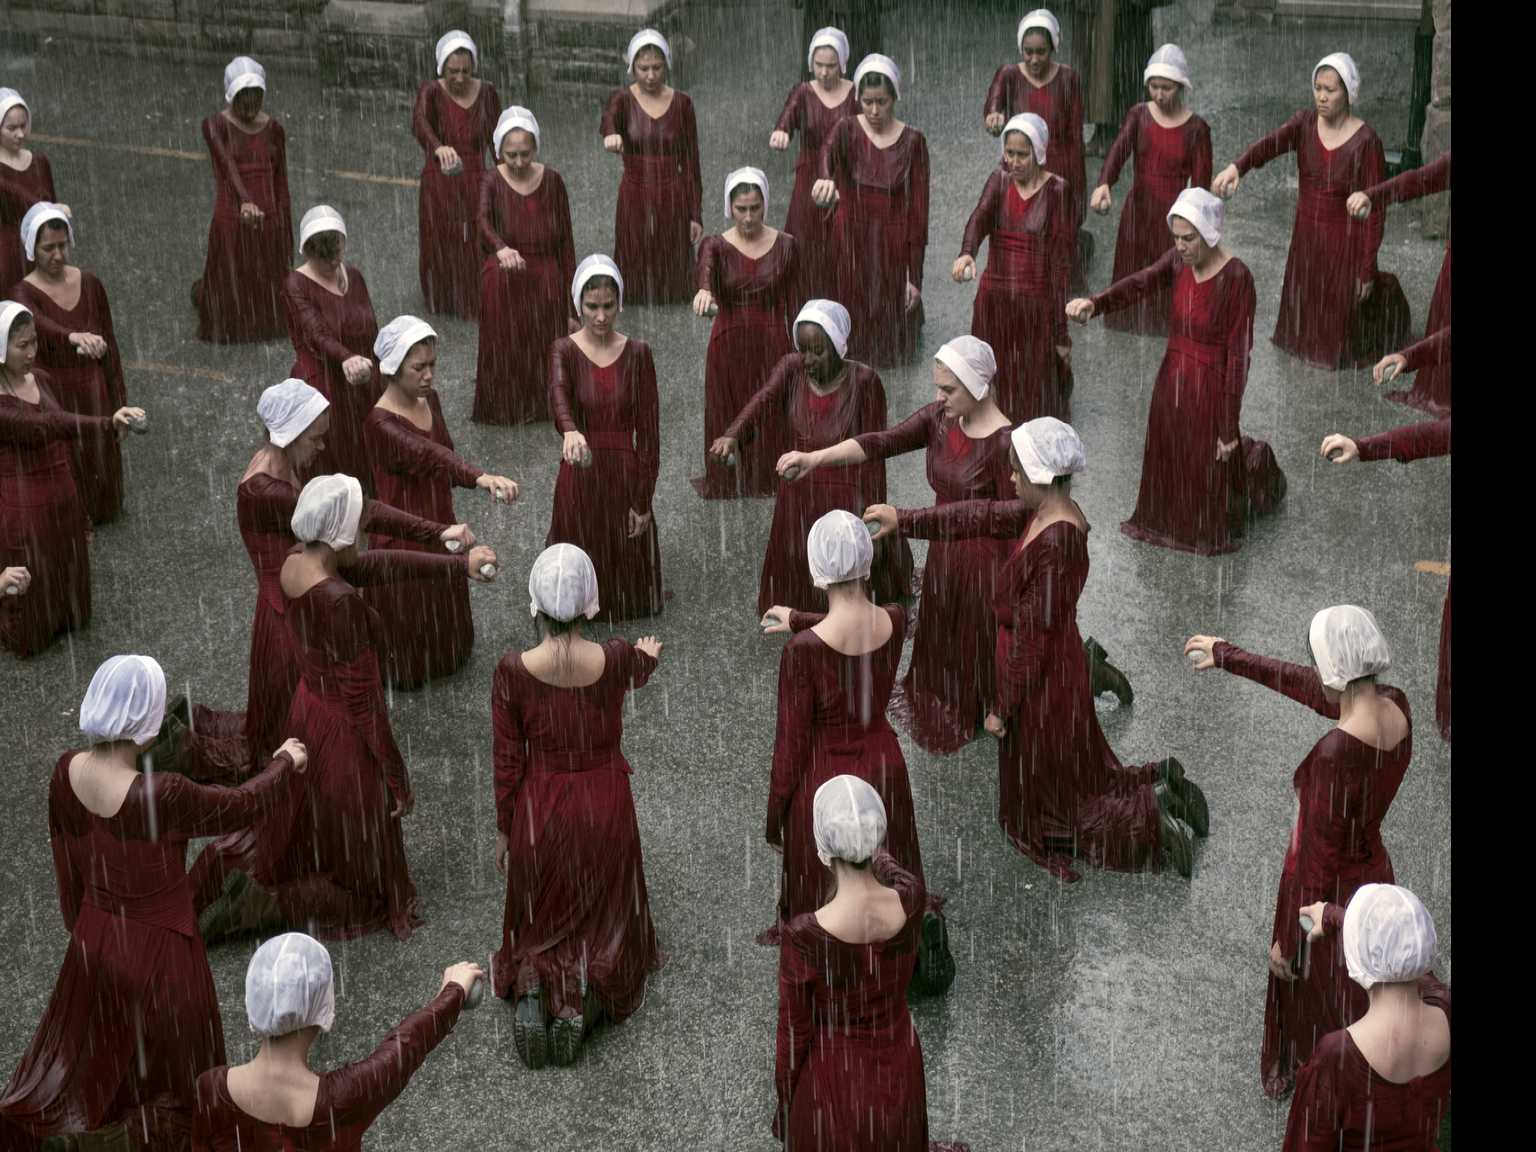 Resistance is Key as 'Handmaid's Tale' Returns for Season 3